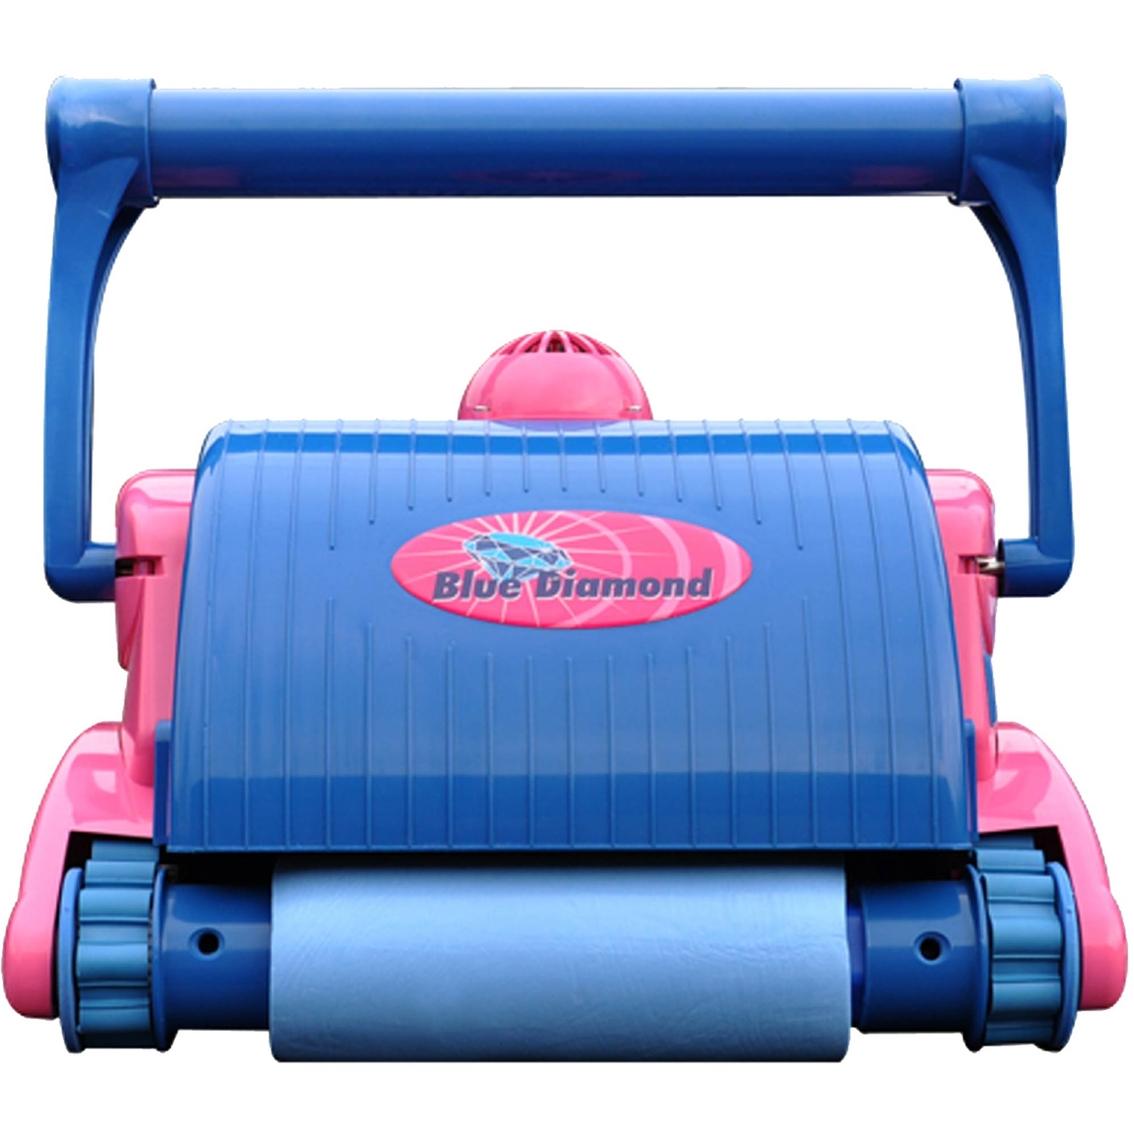 Water Tech Pool Blaster Blue Diamond Robotic Pool Cleaner